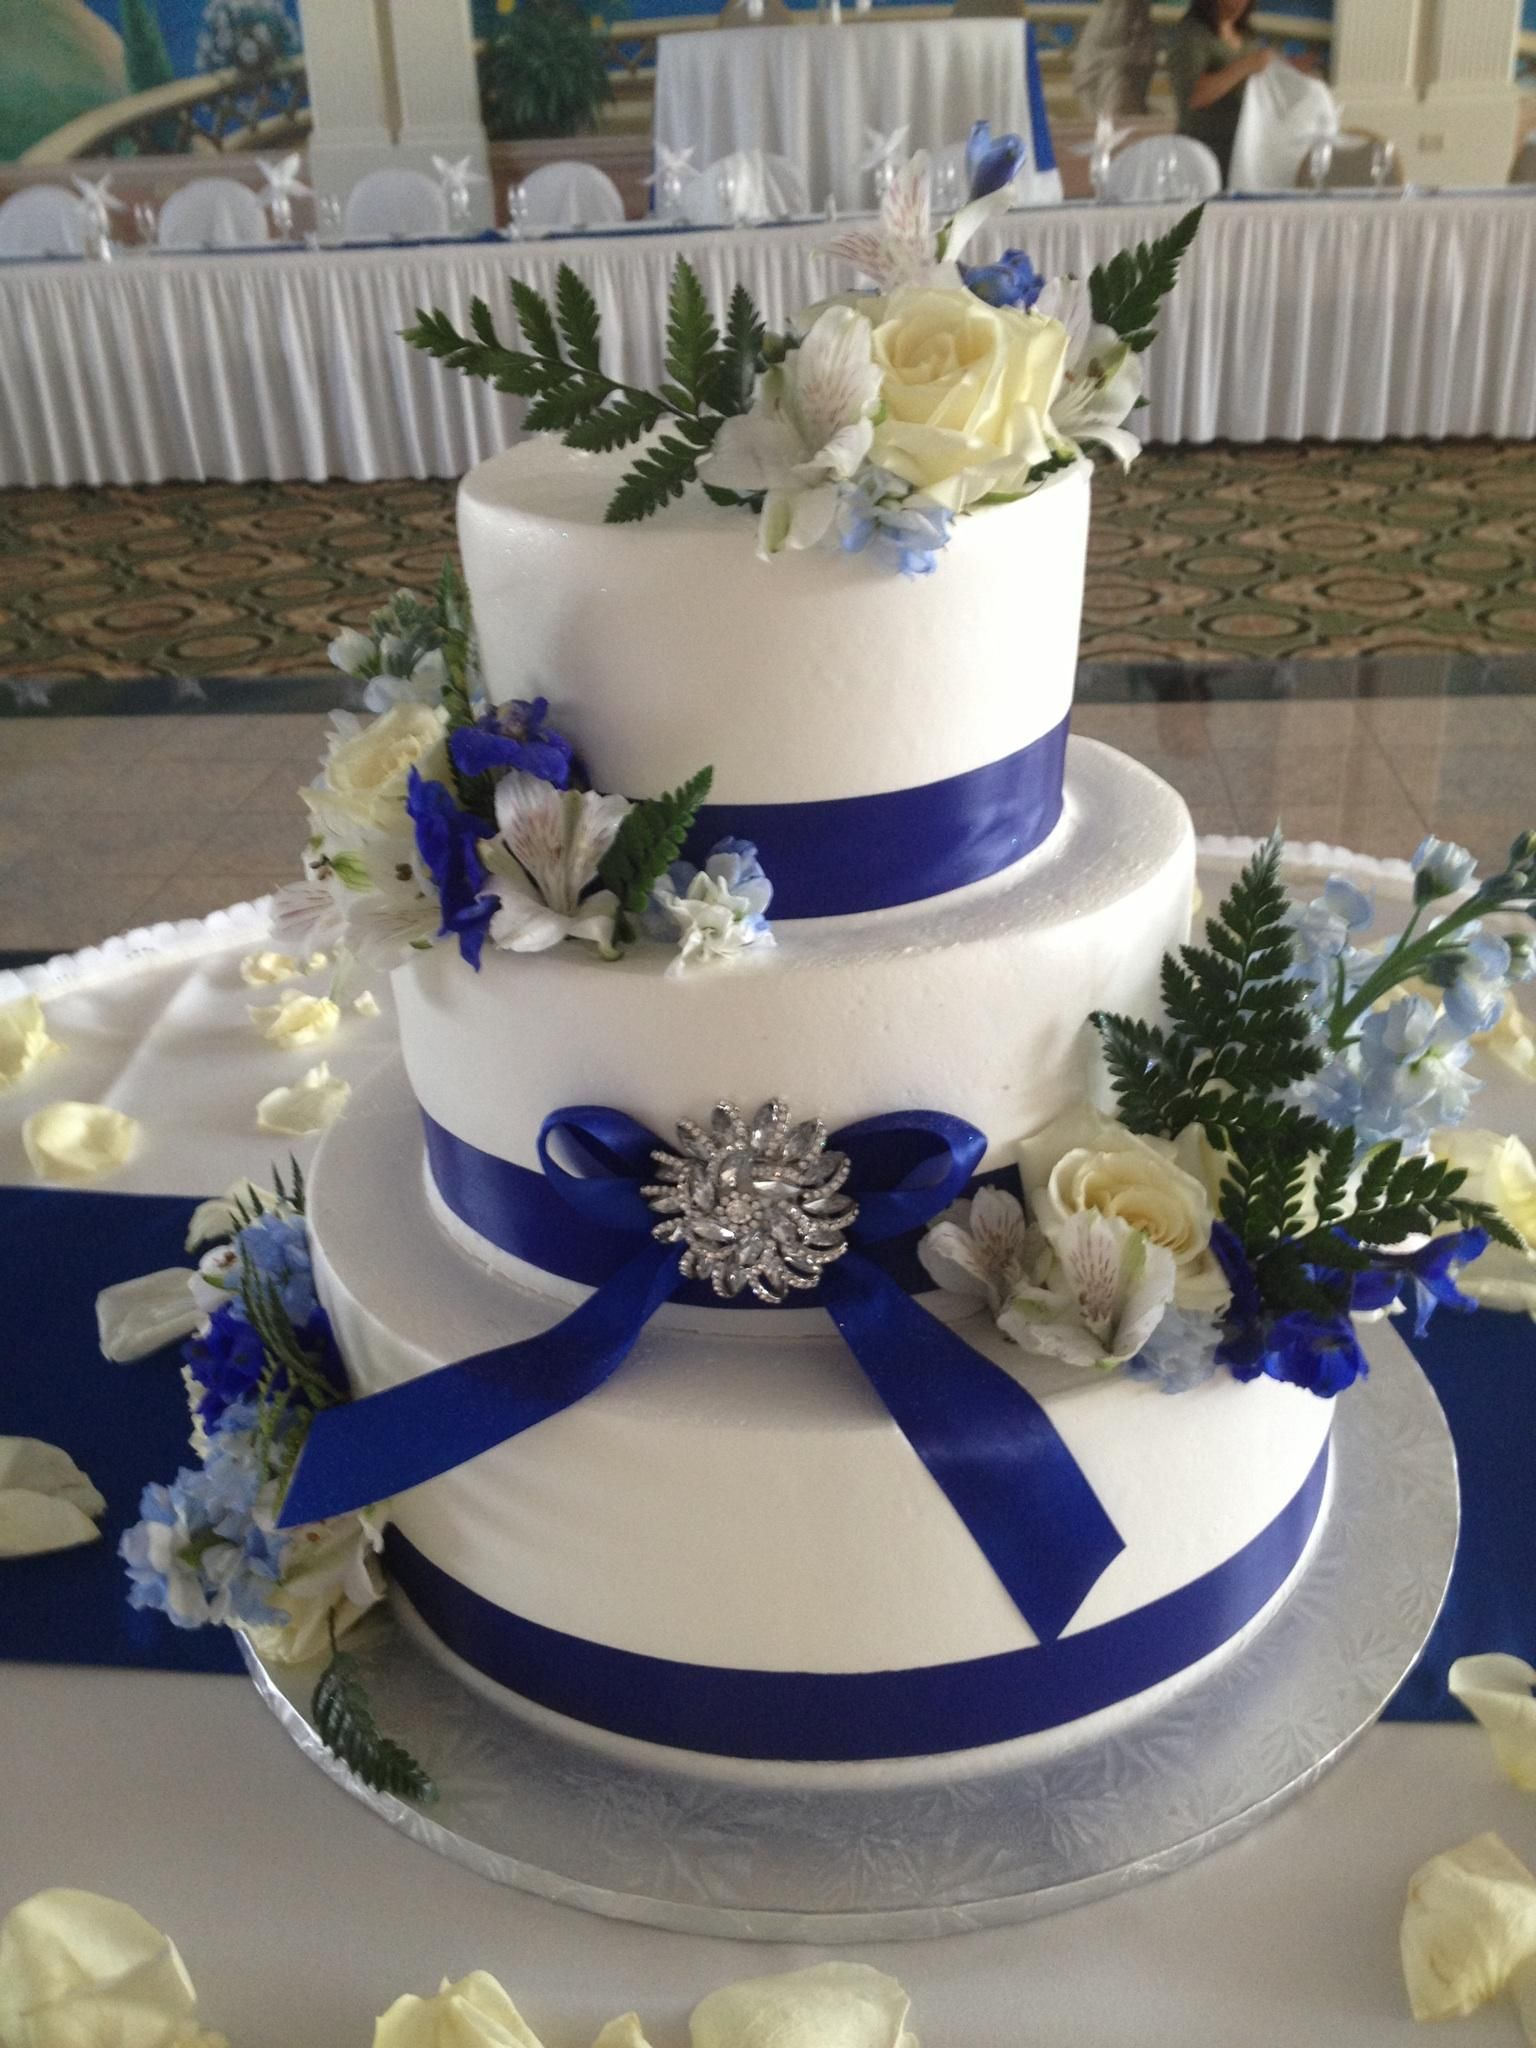 Calumet bakery royal blue ribbon with brooch wedding cake wedding